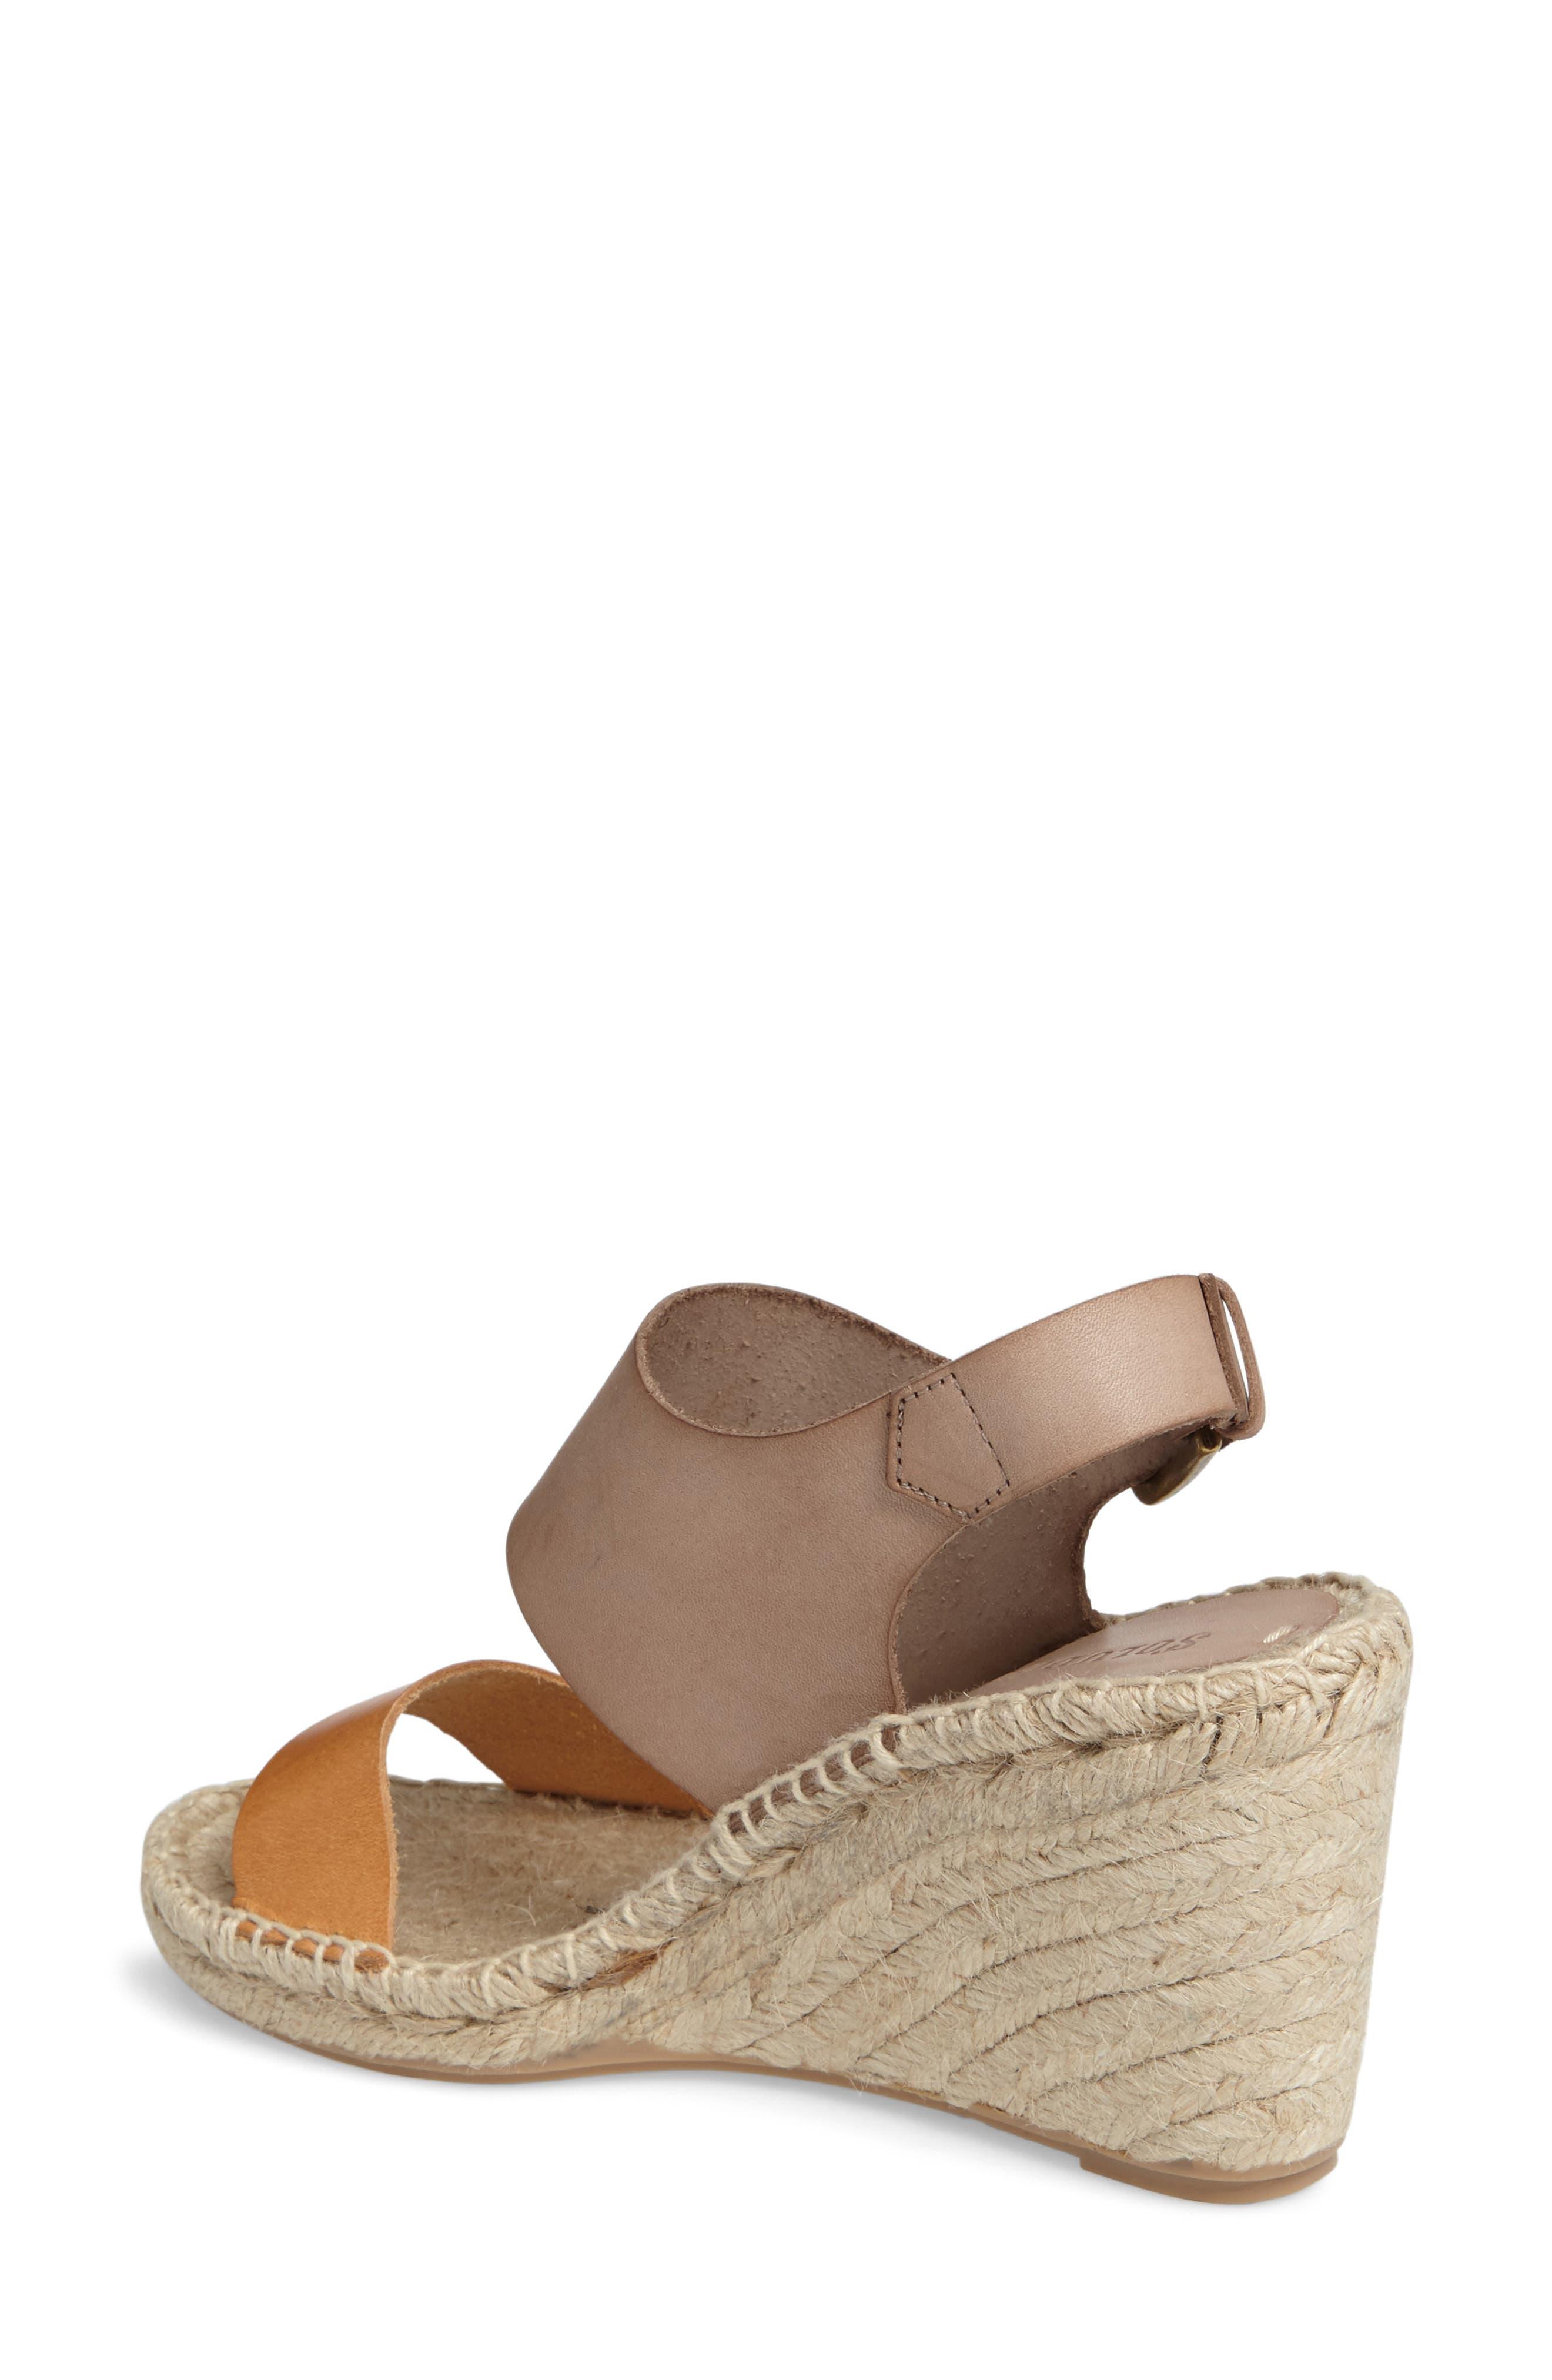 Espadrille Wedge Sandal,                             Alternate thumbnail 2, color,                             022